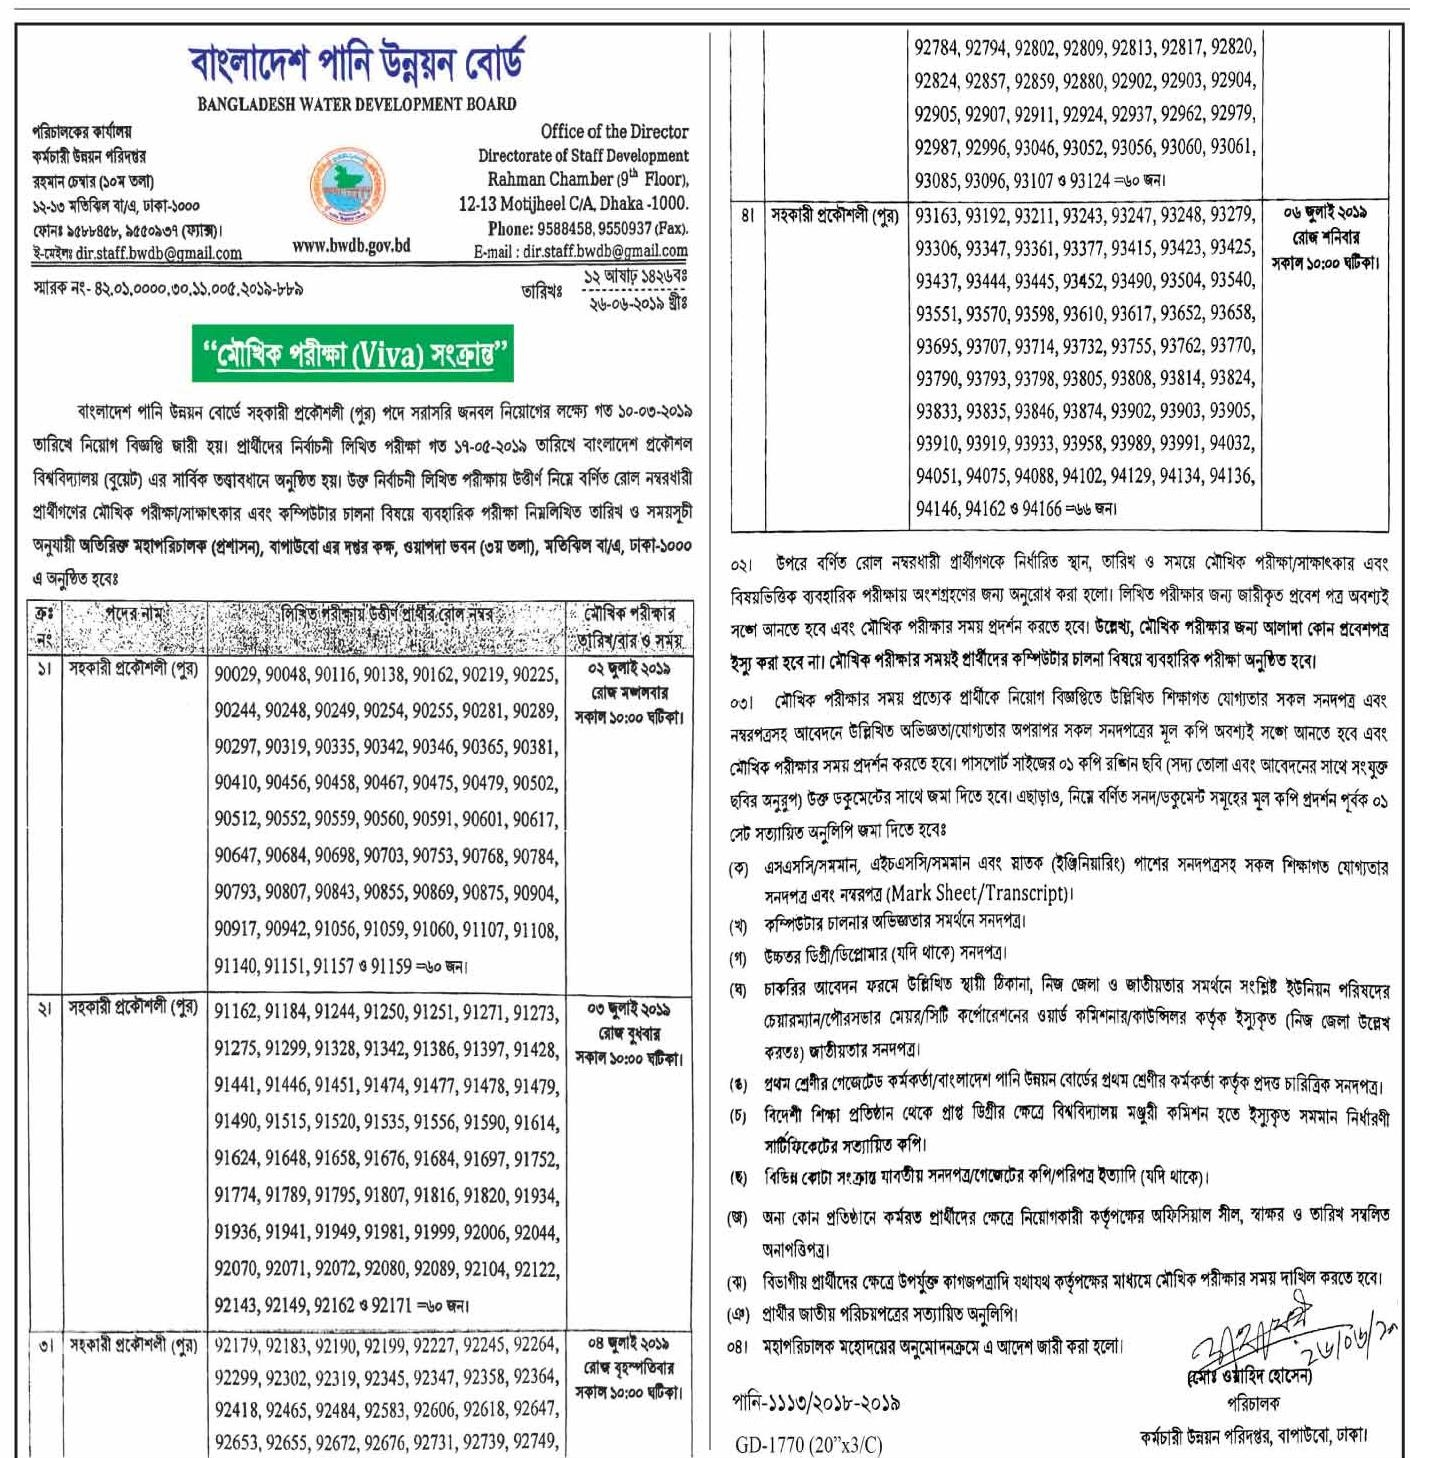 Bangladesh Water Development Board Exam Schedule 2019